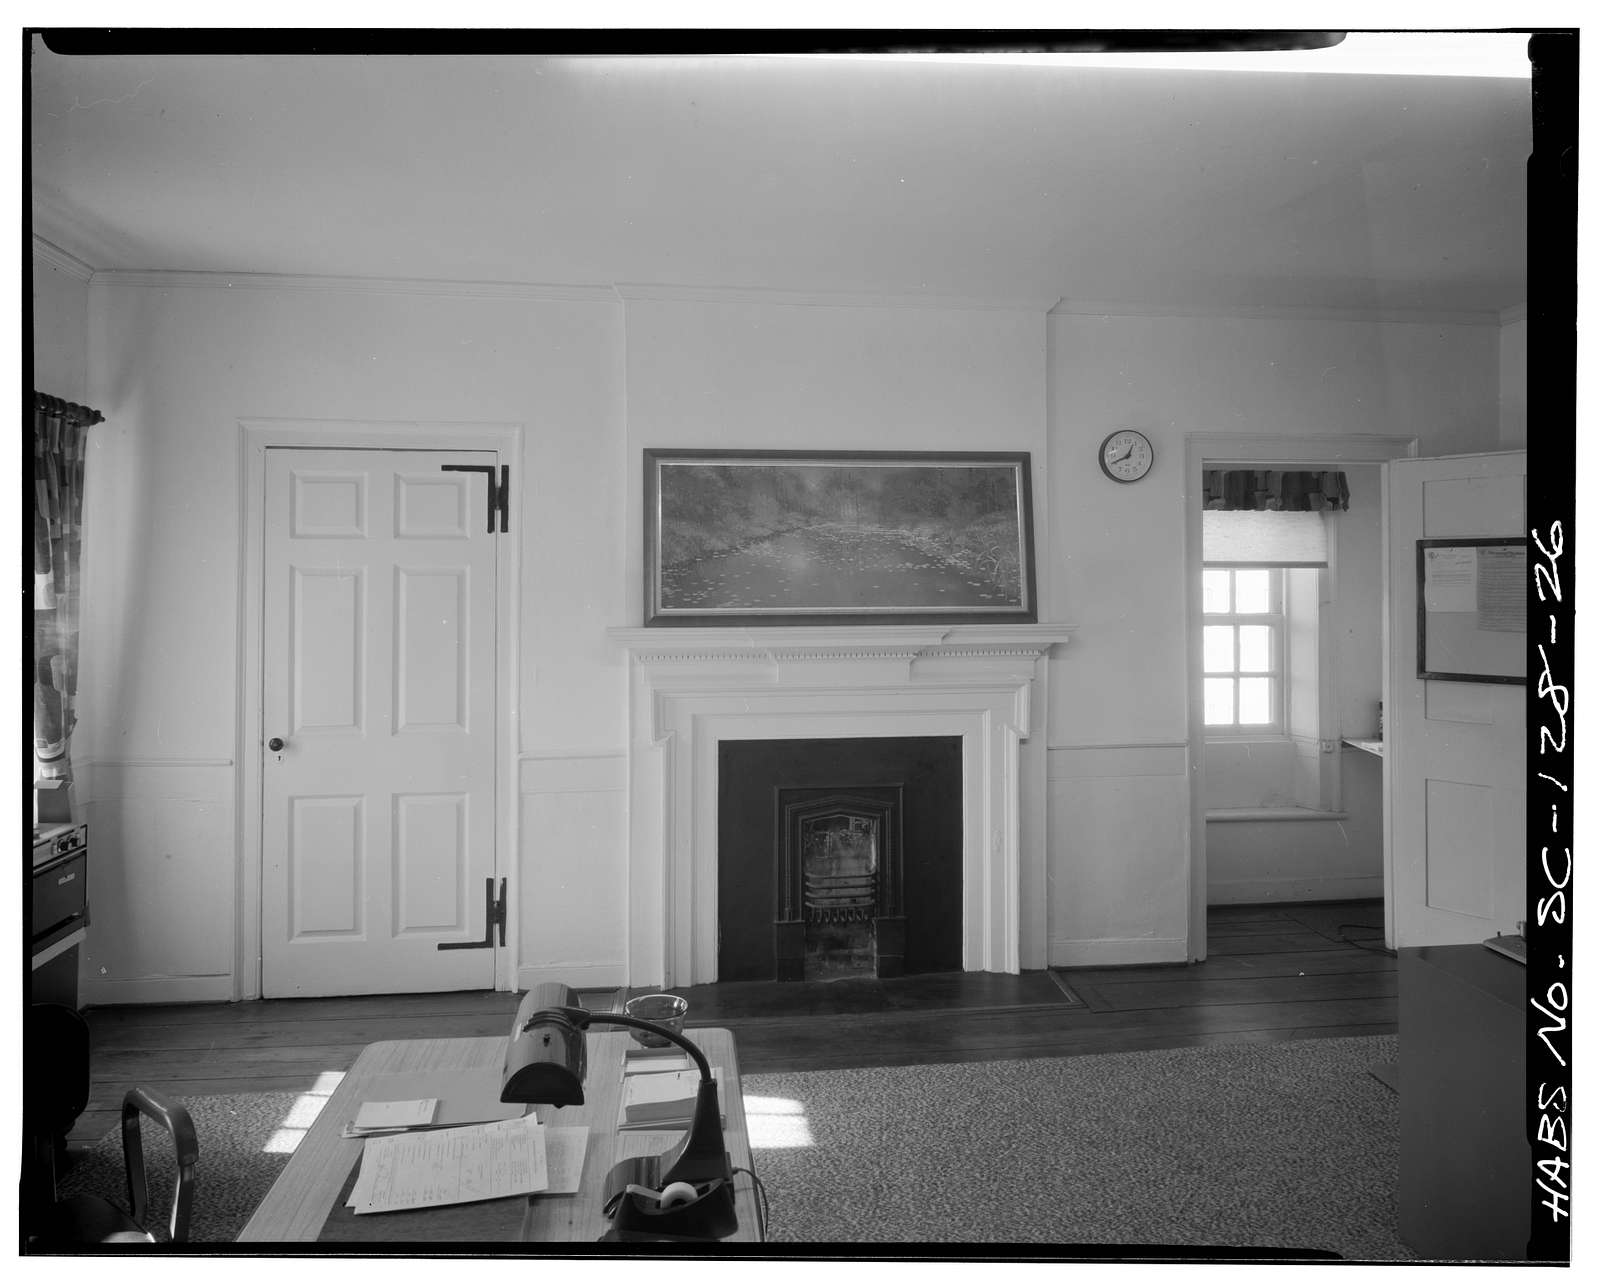 Daniel Blake Tenement, 6-8 (2-4) Courthouse Square, Charleston, Charleston County, SC